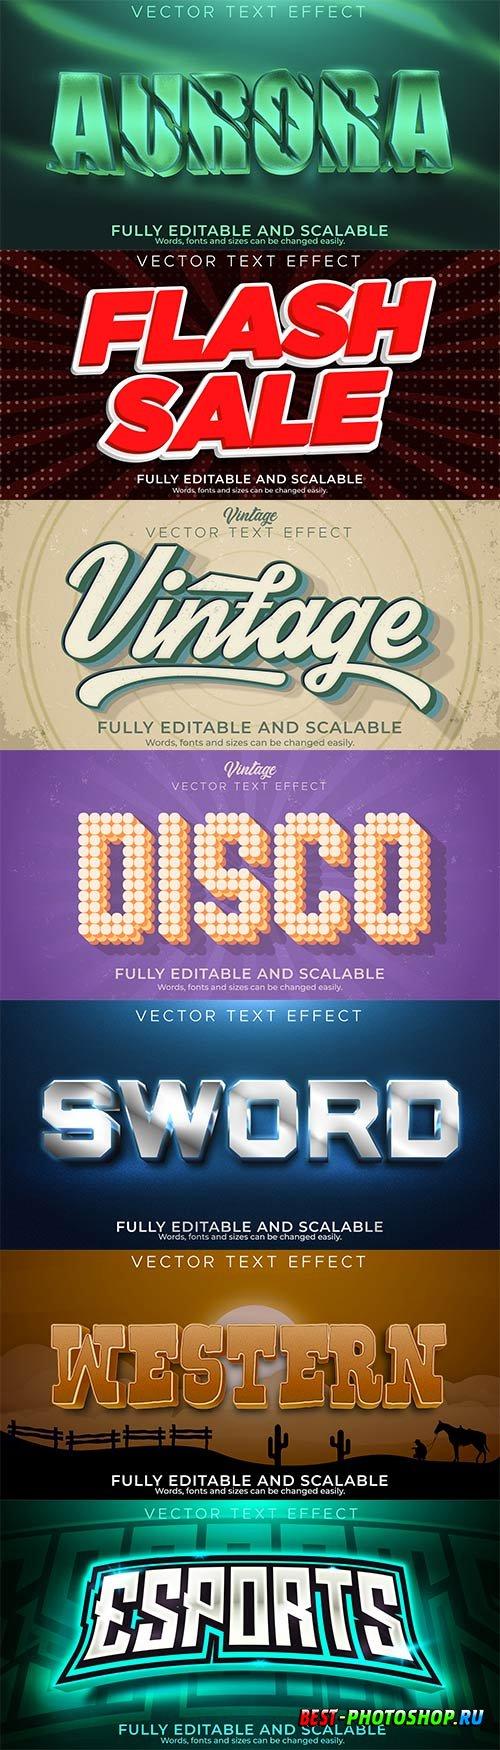 3d editable text style effect vector vol 864